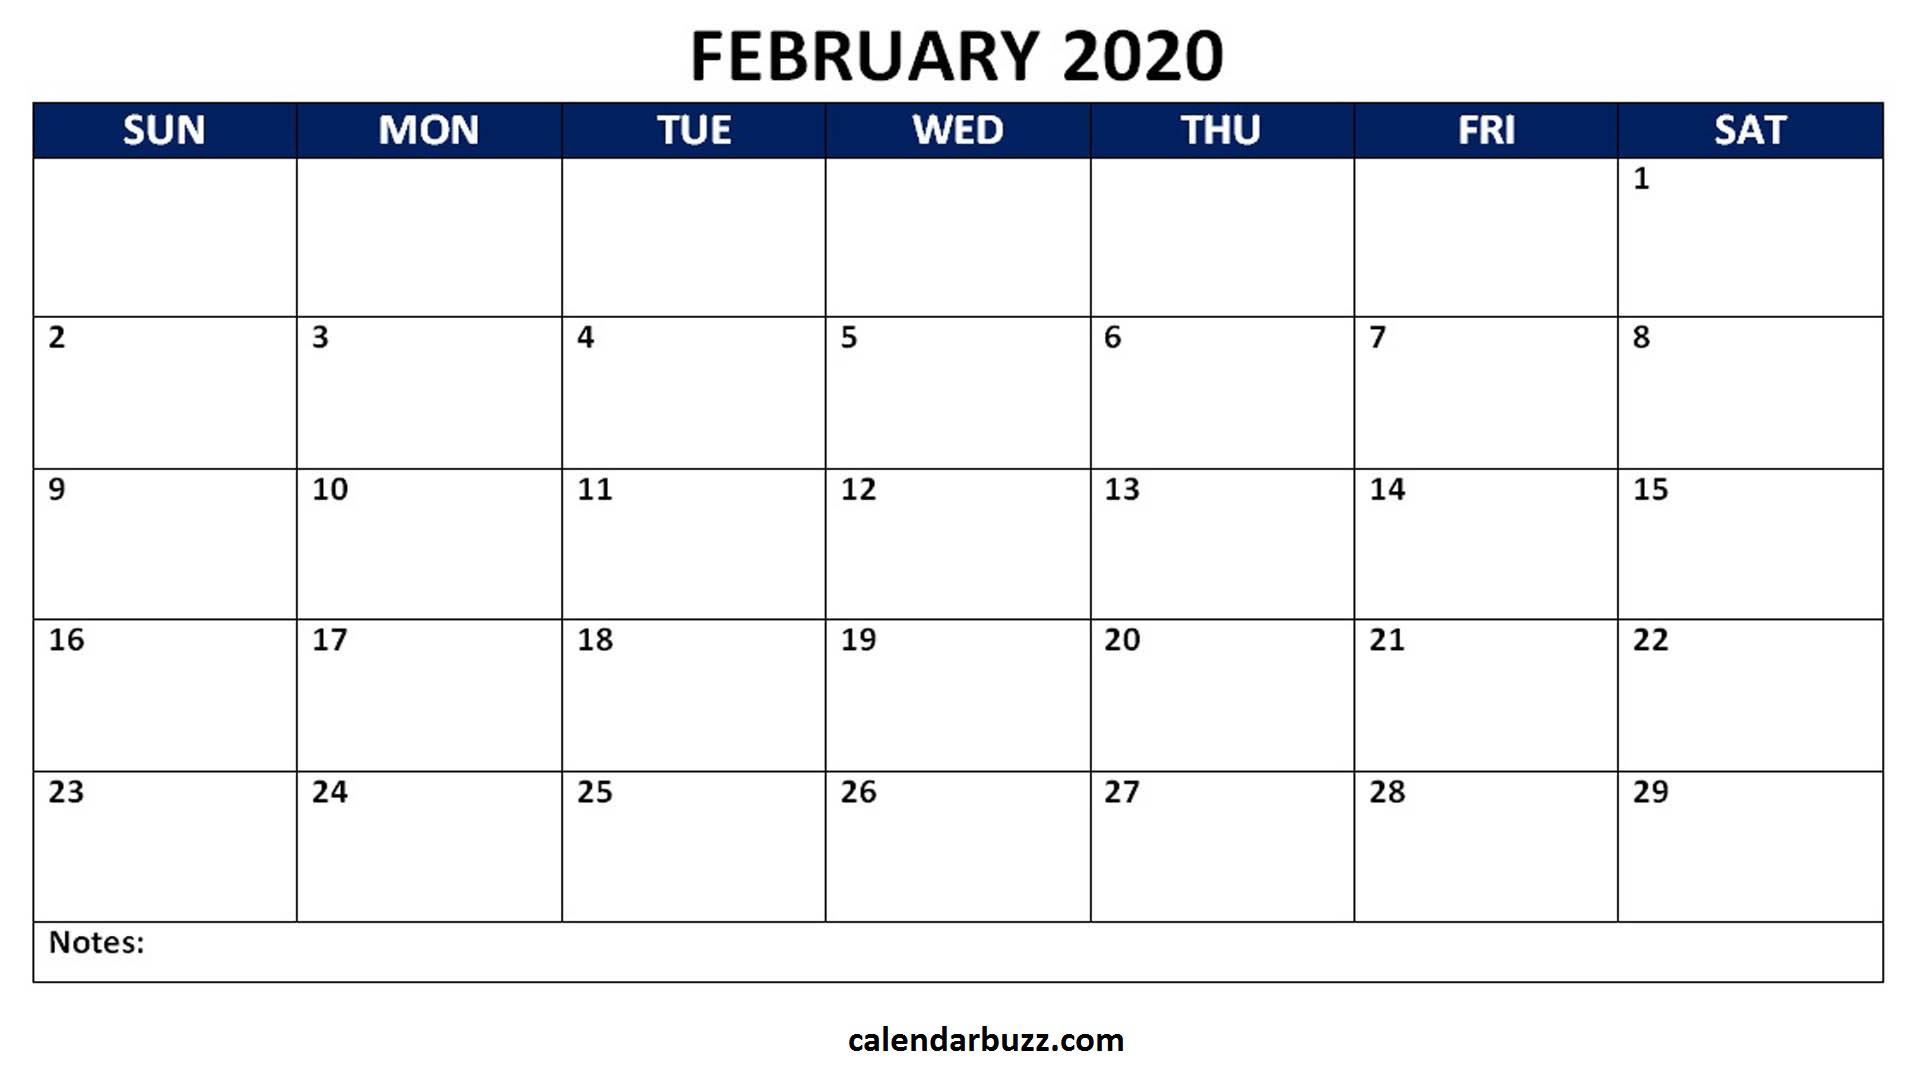 2021 Monthly Calendar Printable Word  Blank Calendar 2021 throughout Blank Monthly Calendar 2021